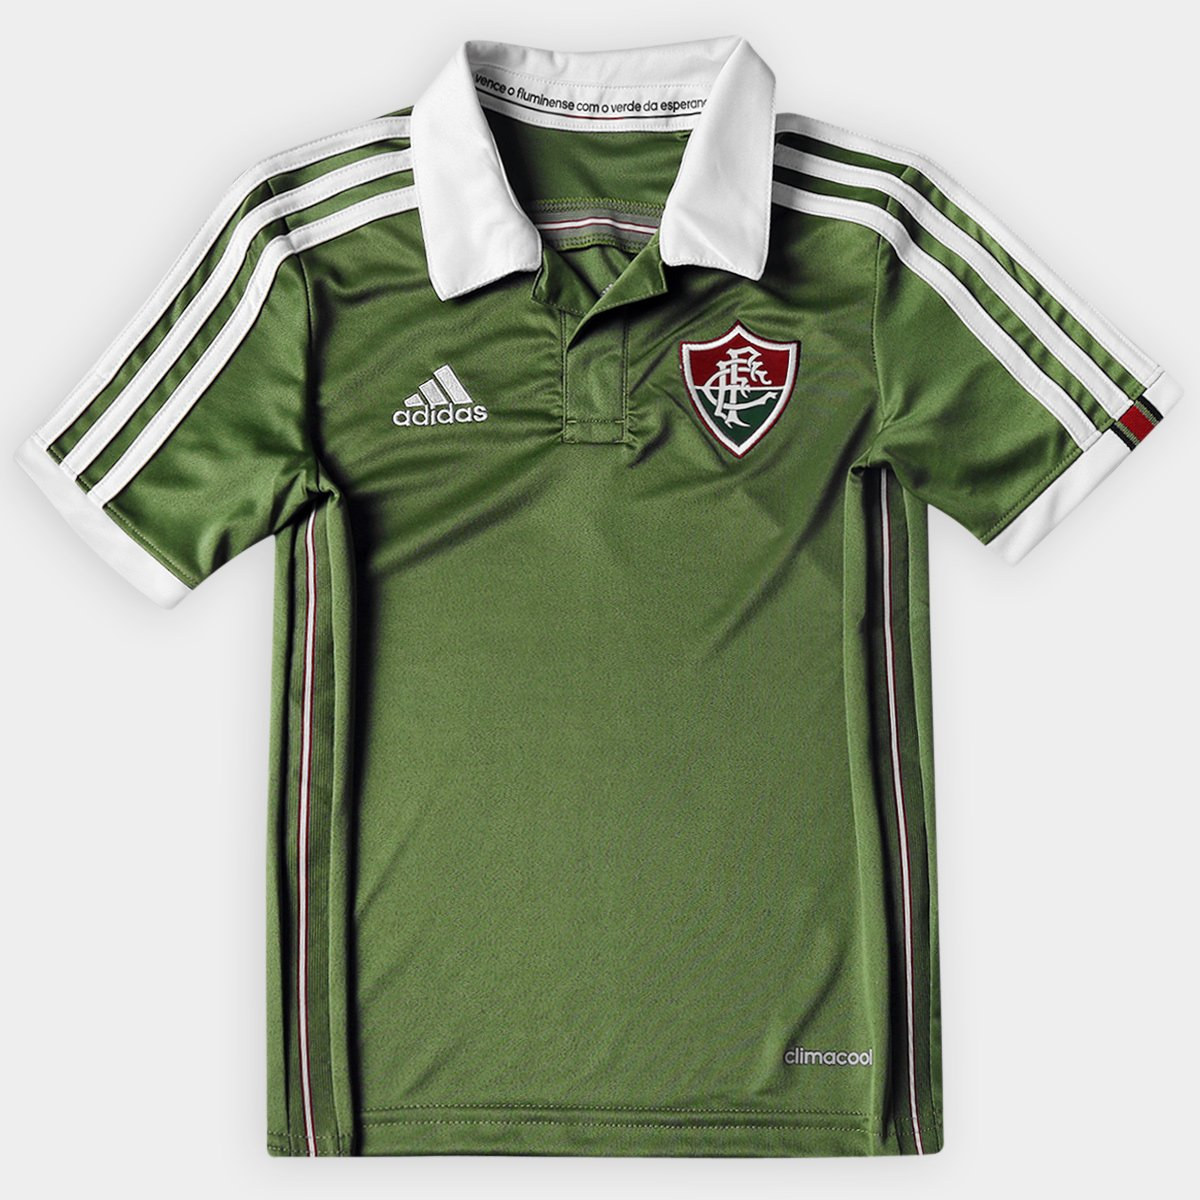 Camisa Fluminense Infantil III 2015 s nº Torcedor Adidas - Compre Agora  5c5b24ab06235